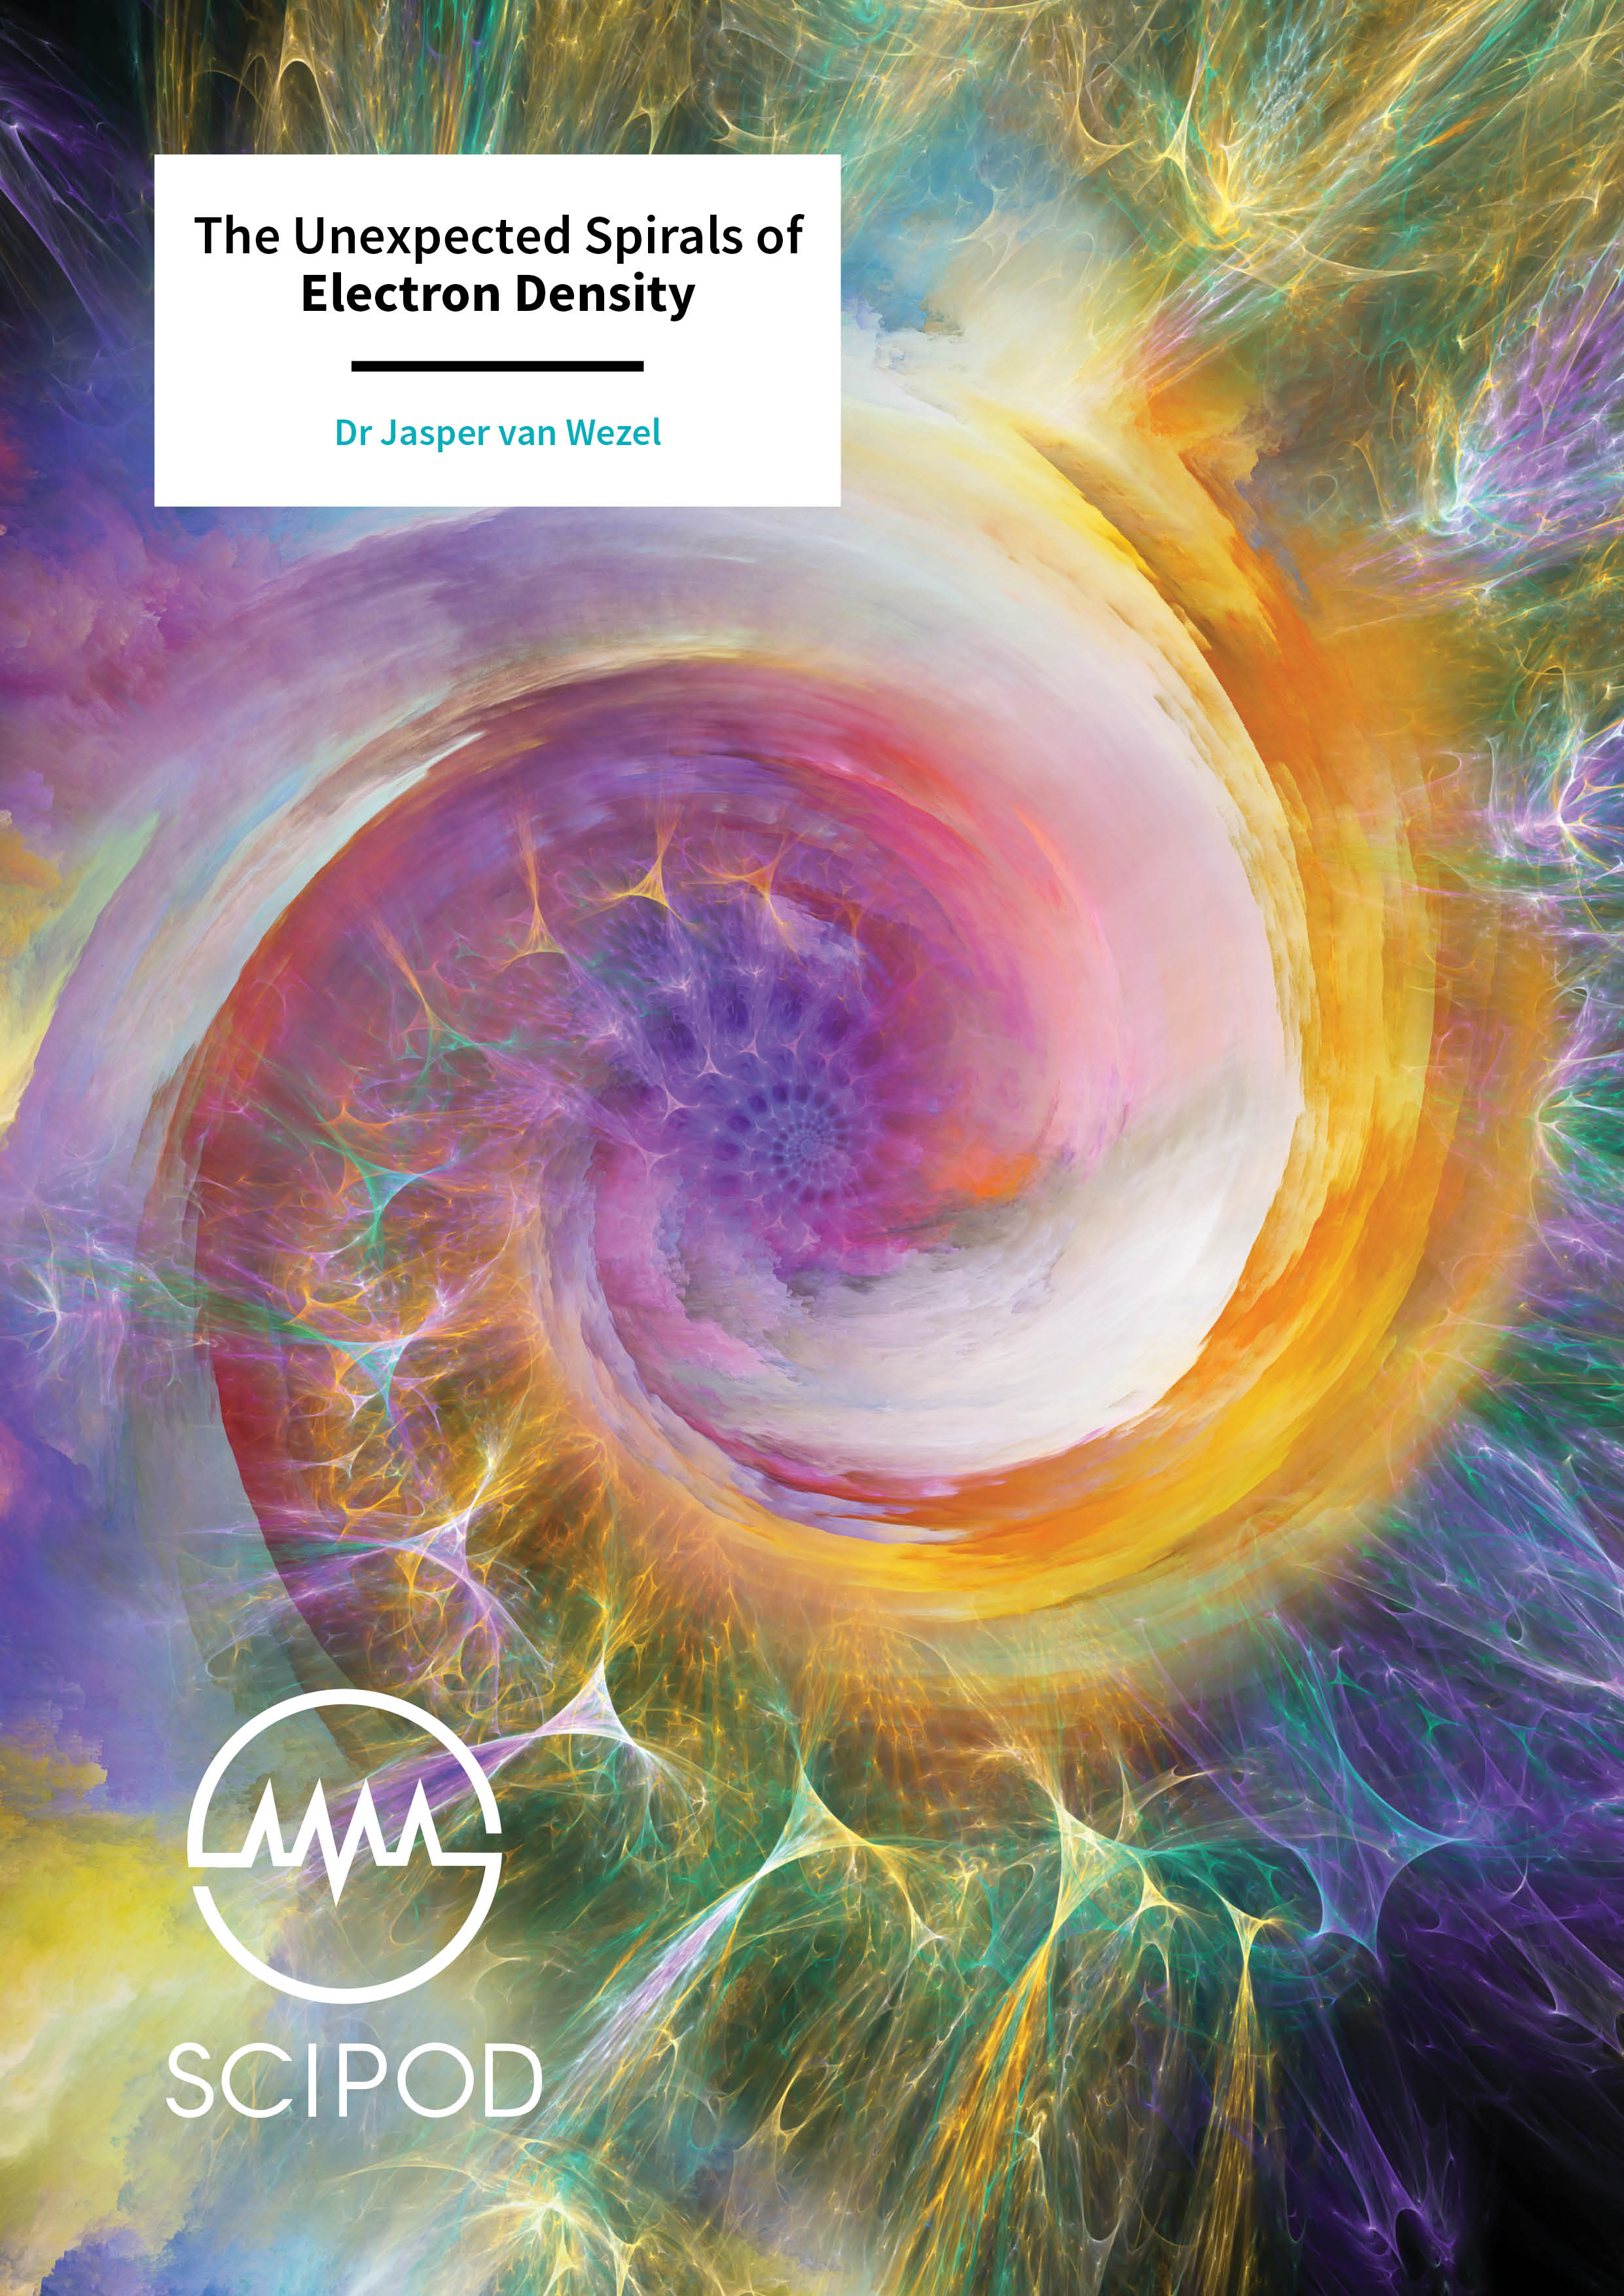 The Unexpected Spirals of Electron Density – Dr Jasper van Wezel, University of Amsterdam